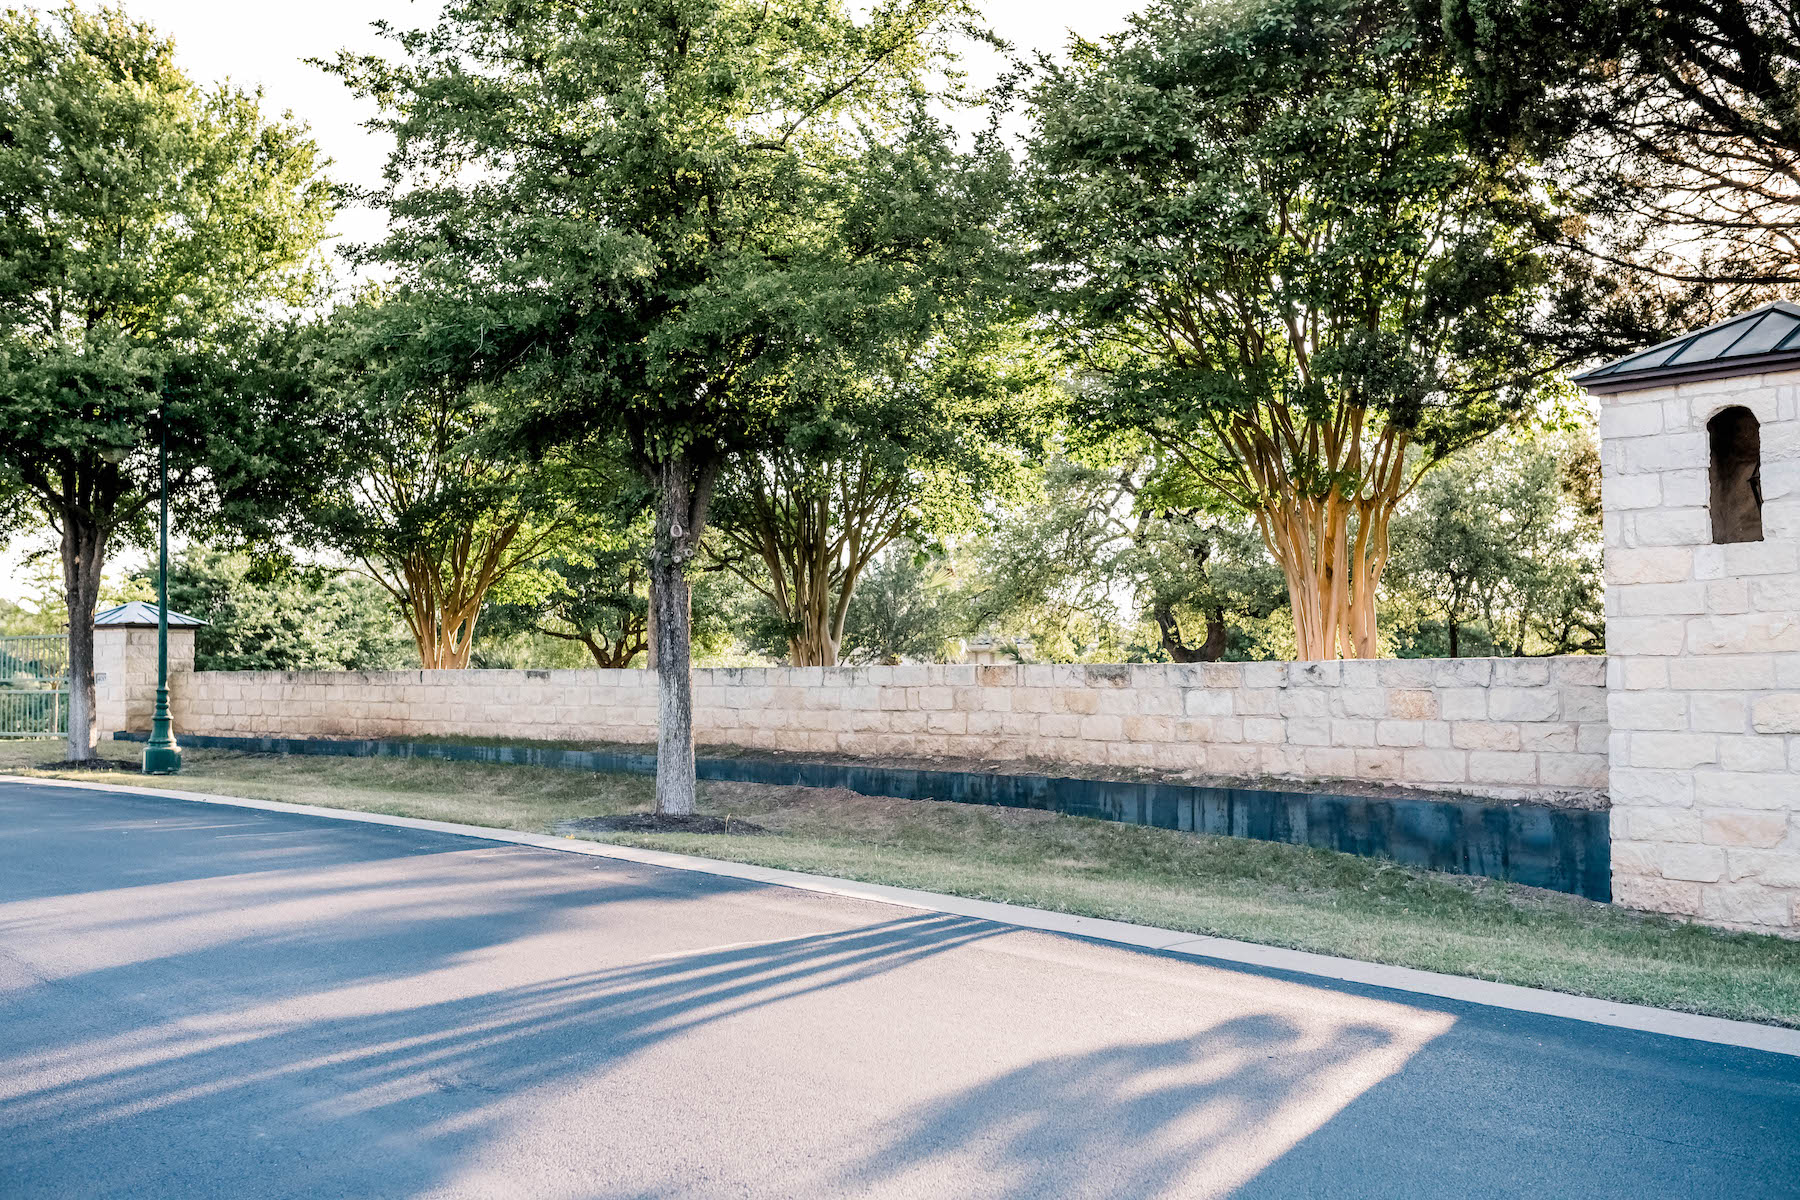 Decorative retaining wall